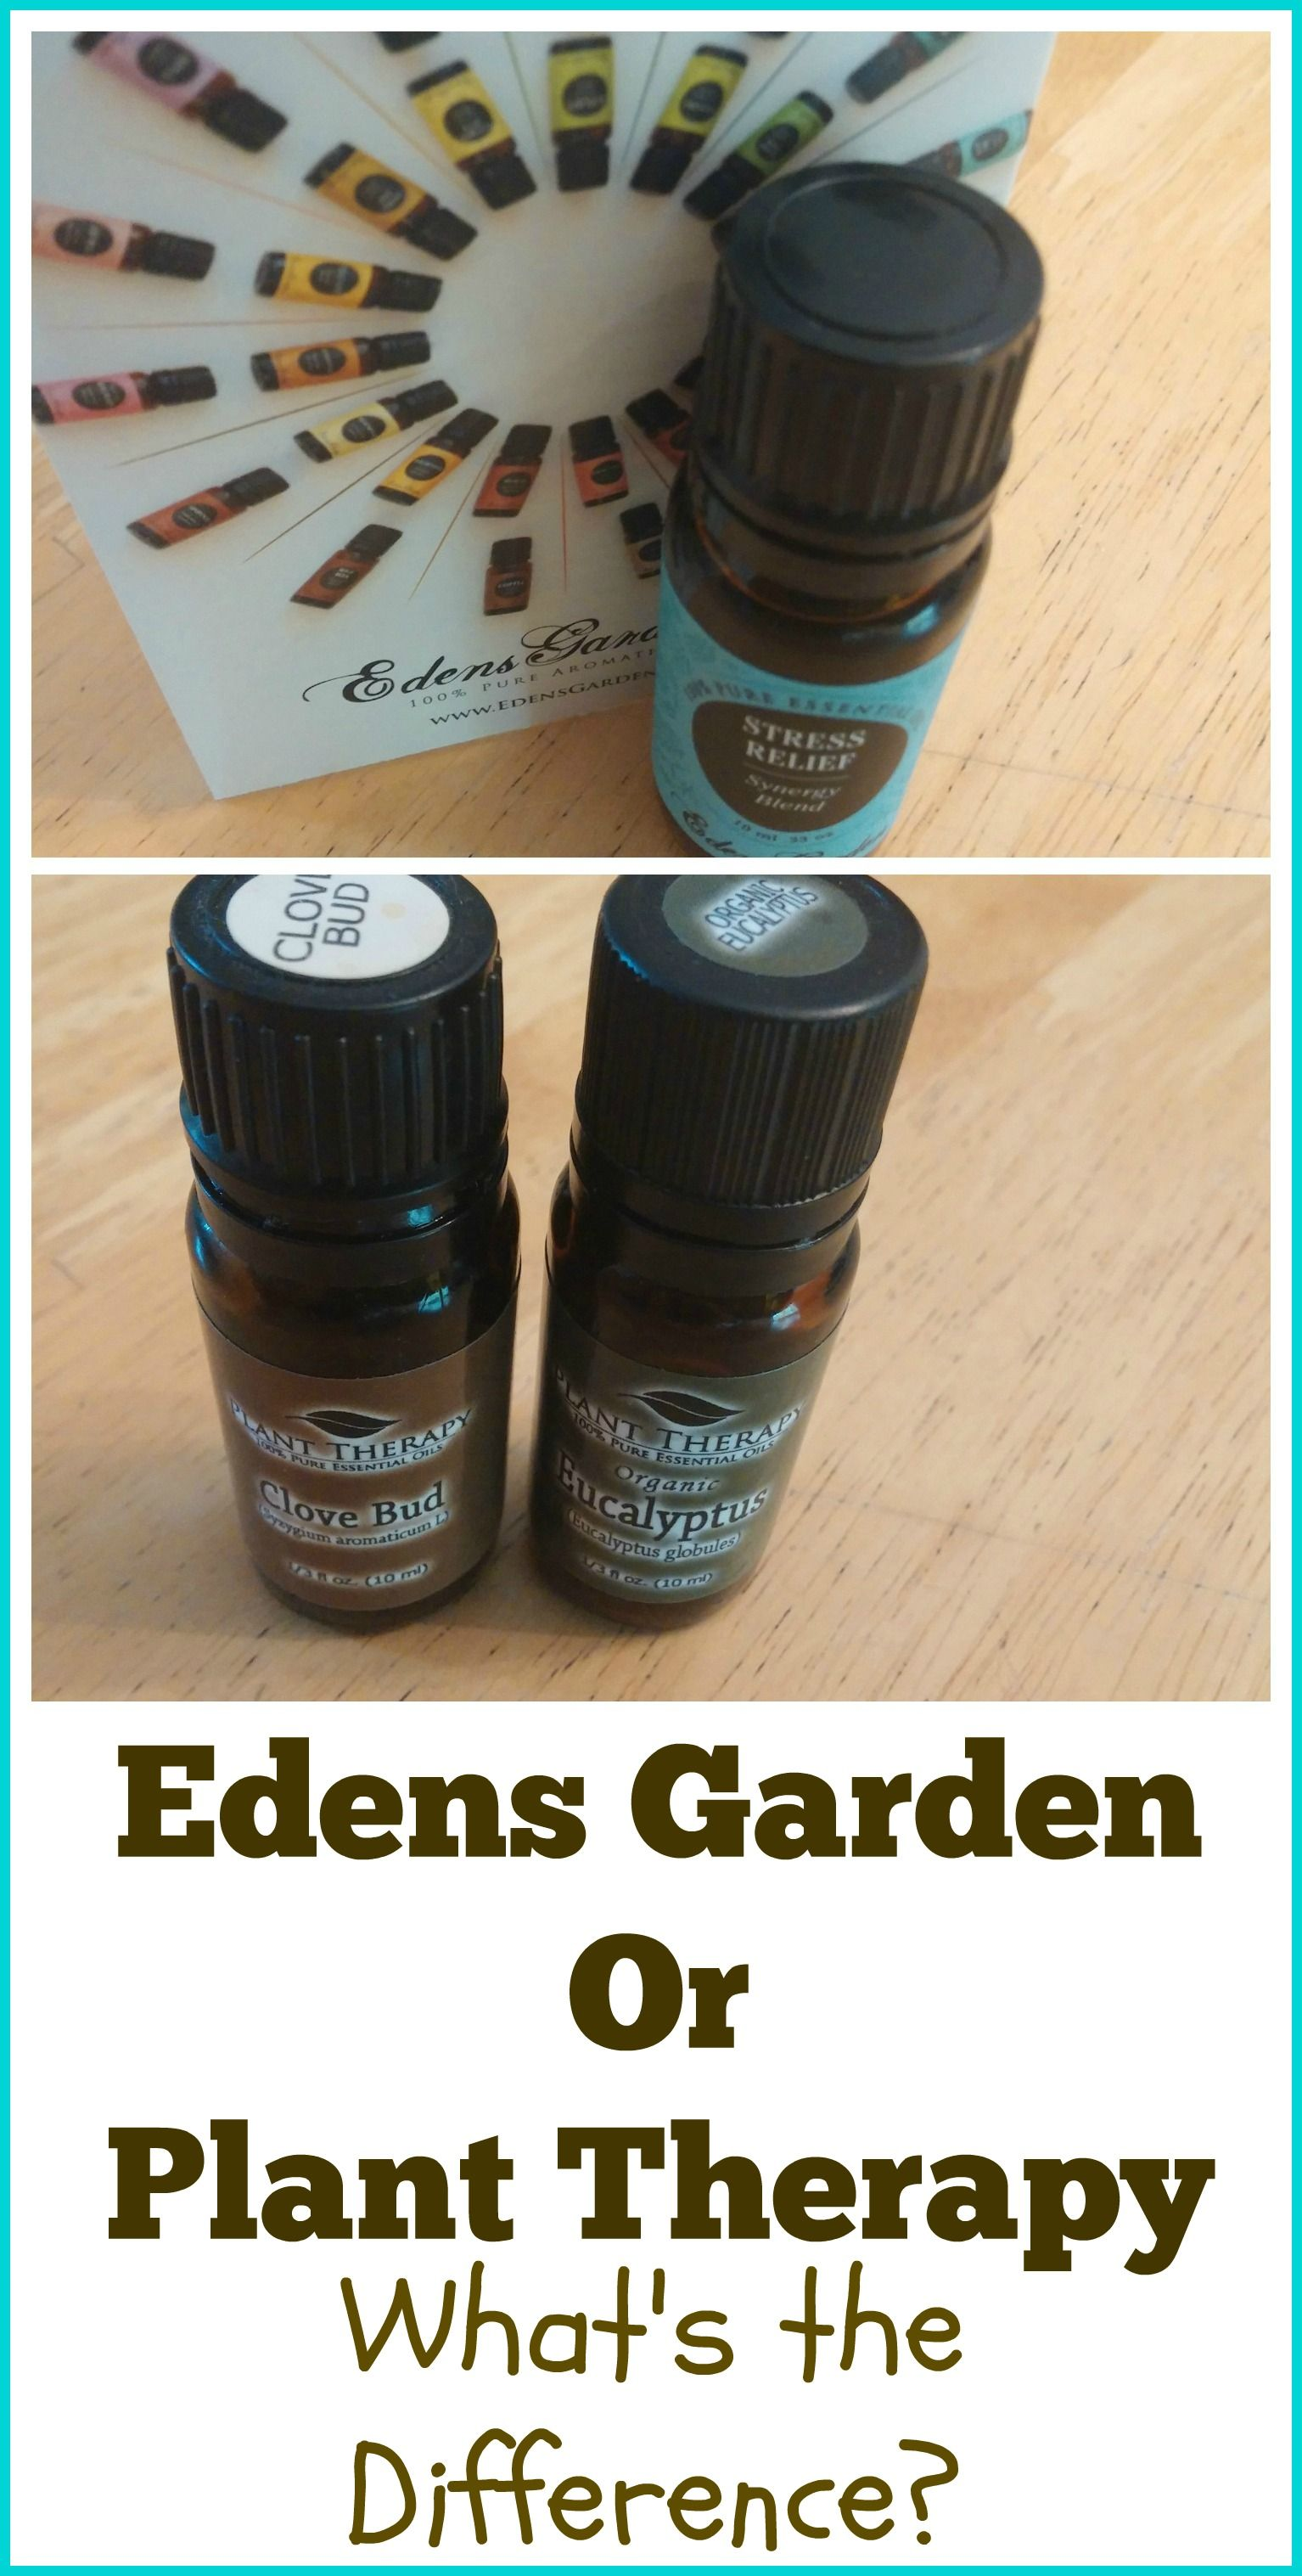 Edens Garden vs Plant Therapy Plant therapy, Edens